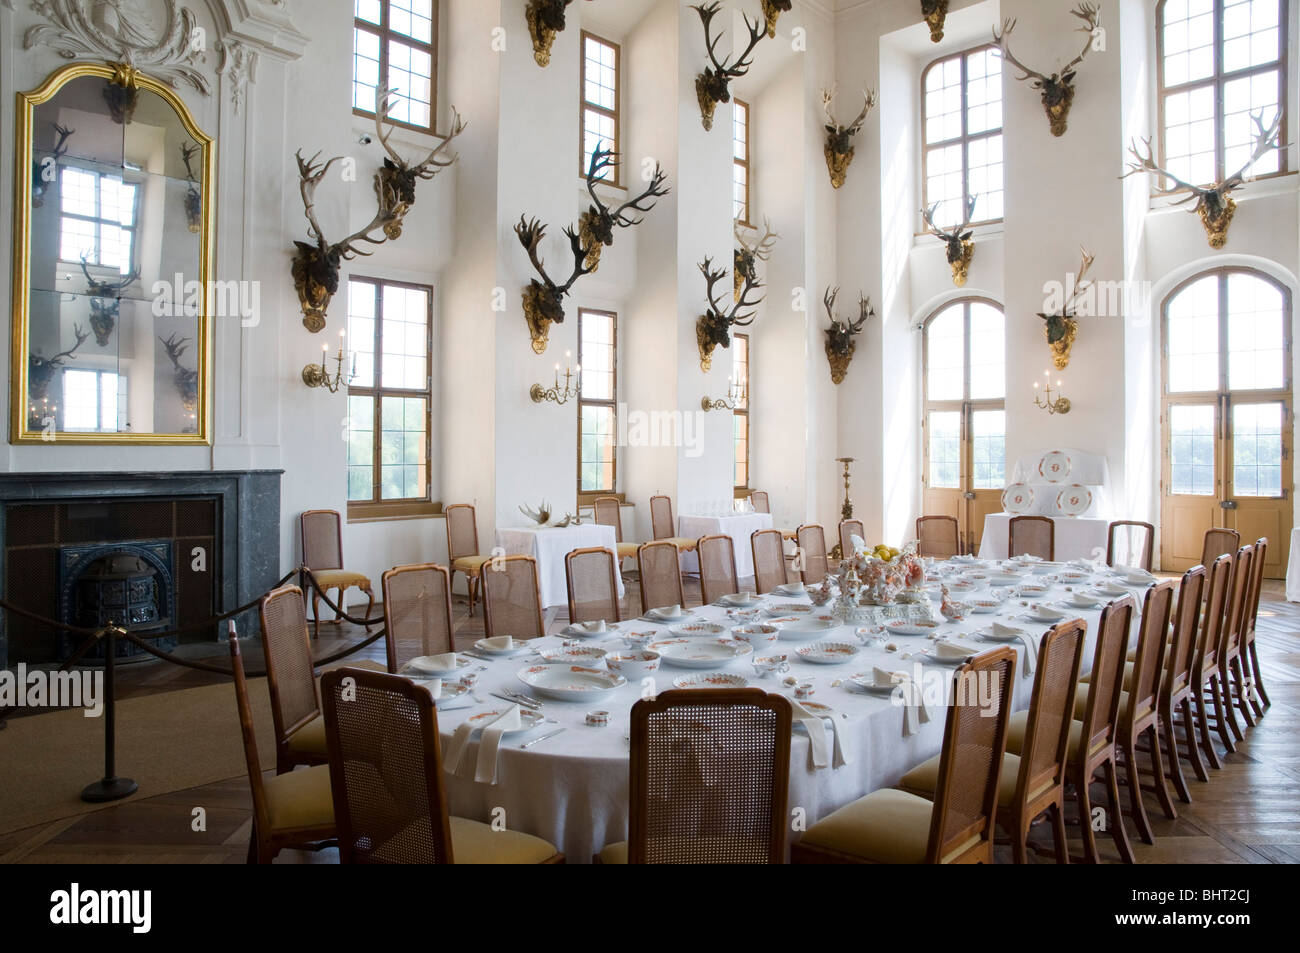 Schloss Moritzburg Innen, Speisesaal, Dresden, Sachsen, Deutschland |  Castle Moritzburg, Interior, Dining Hall, Dresden, Germany